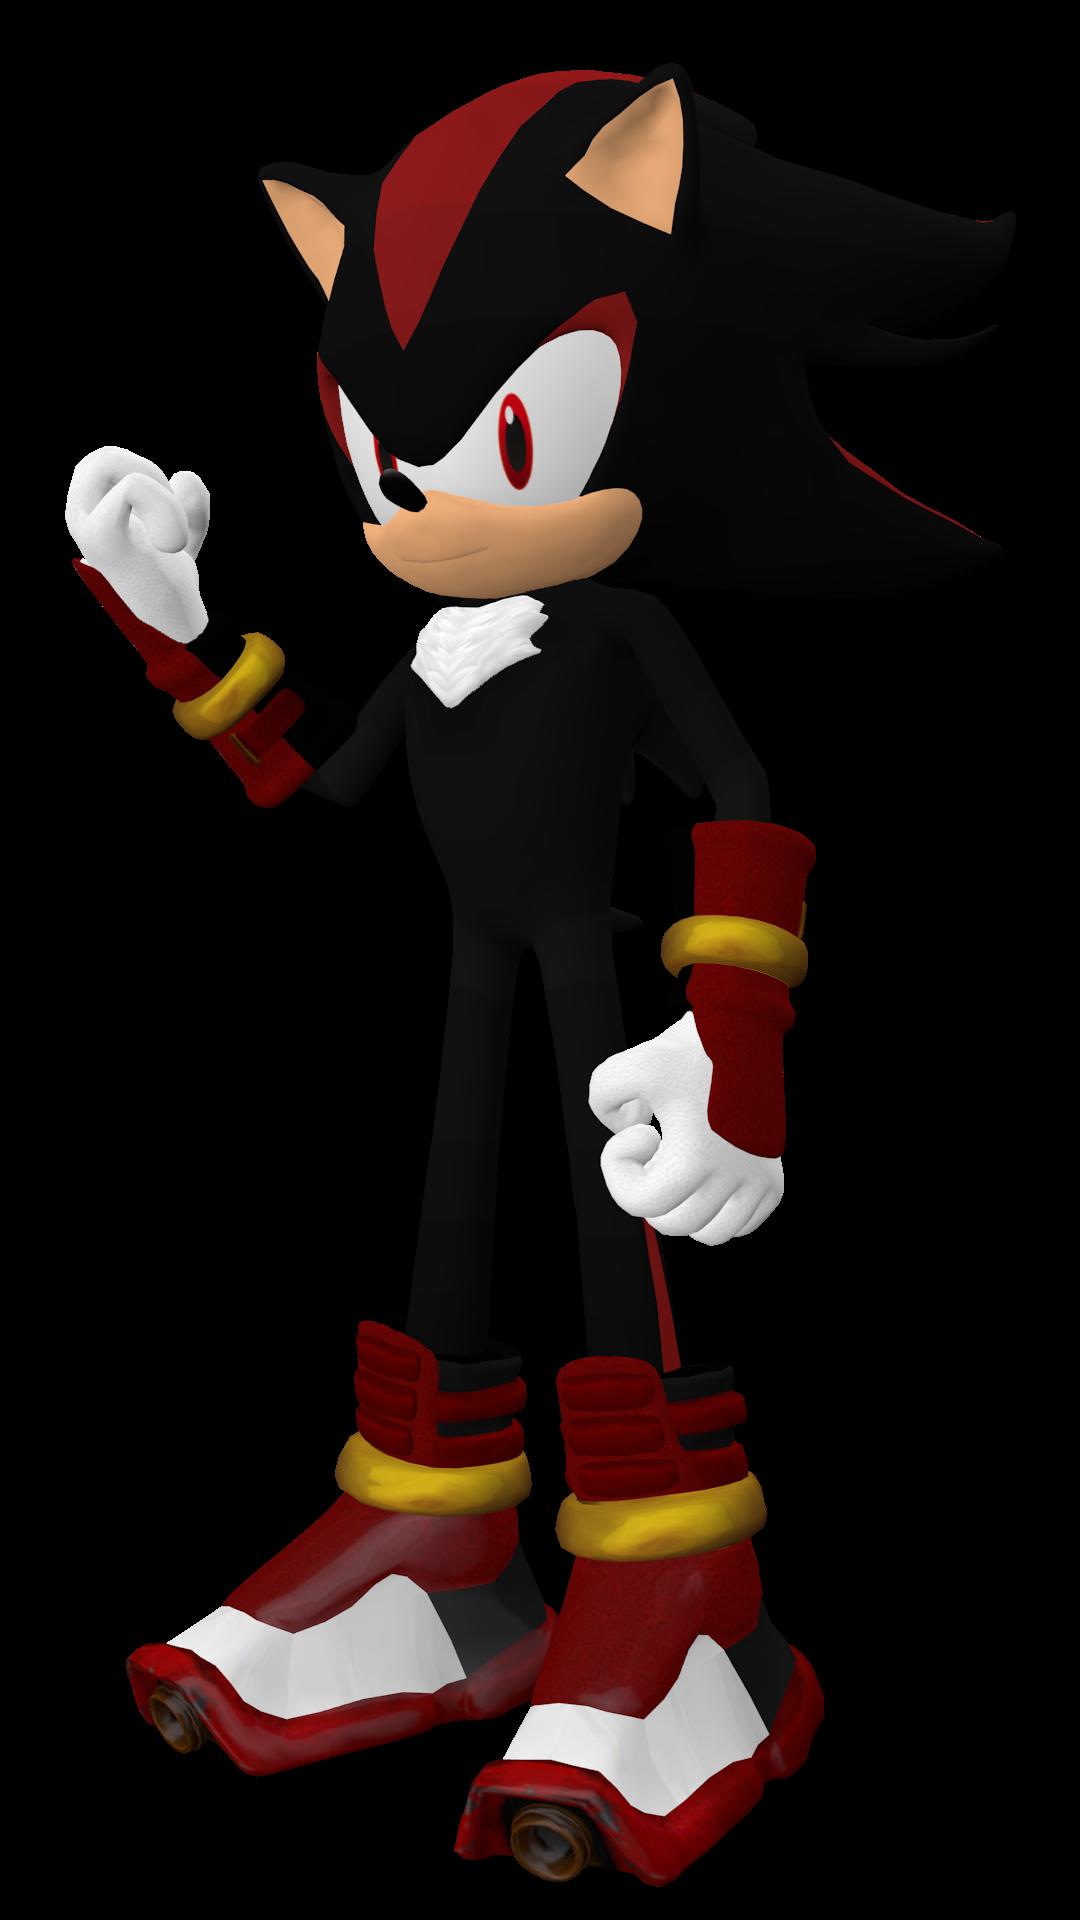 Sonic boom shadow by detexki99 on deviantart - Shadow sonic boom ...